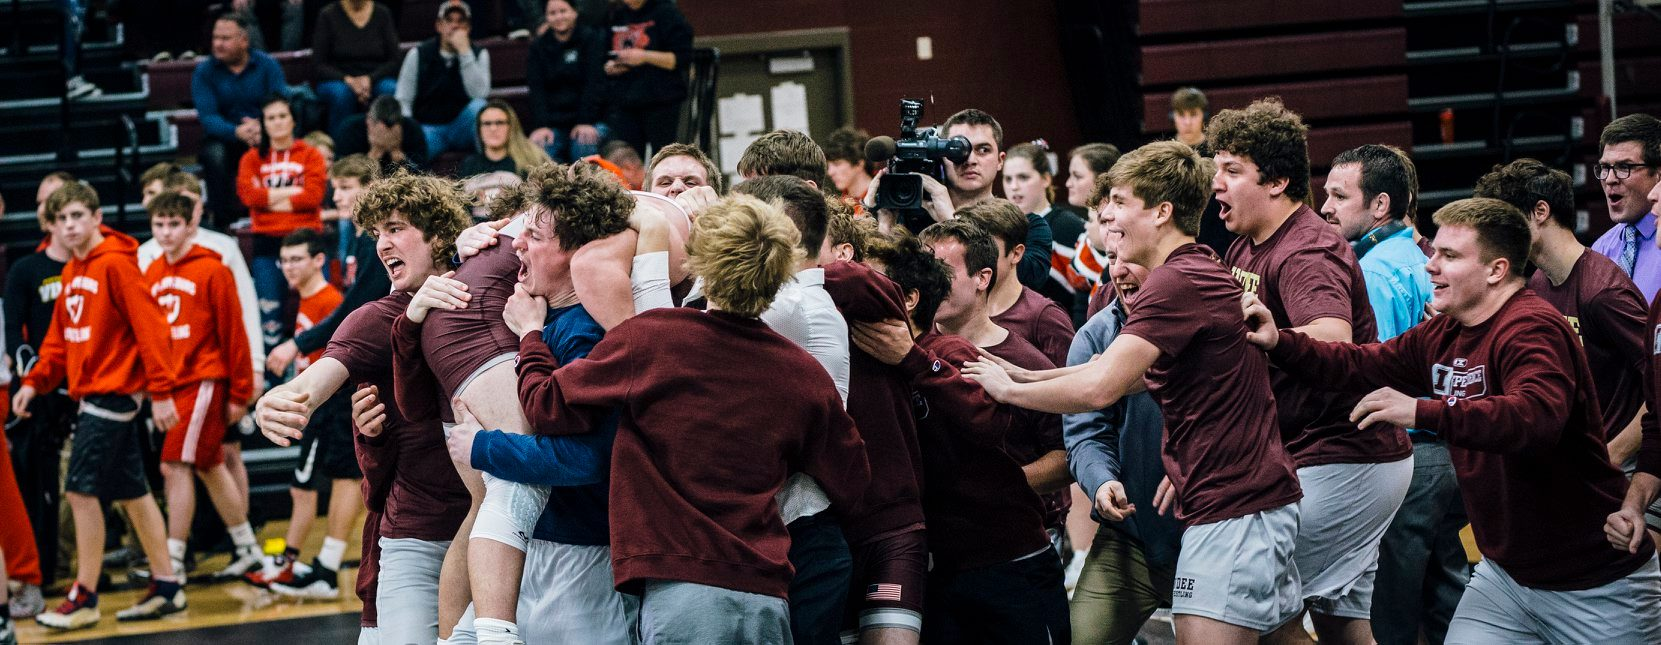 wrestling team celebrates a win